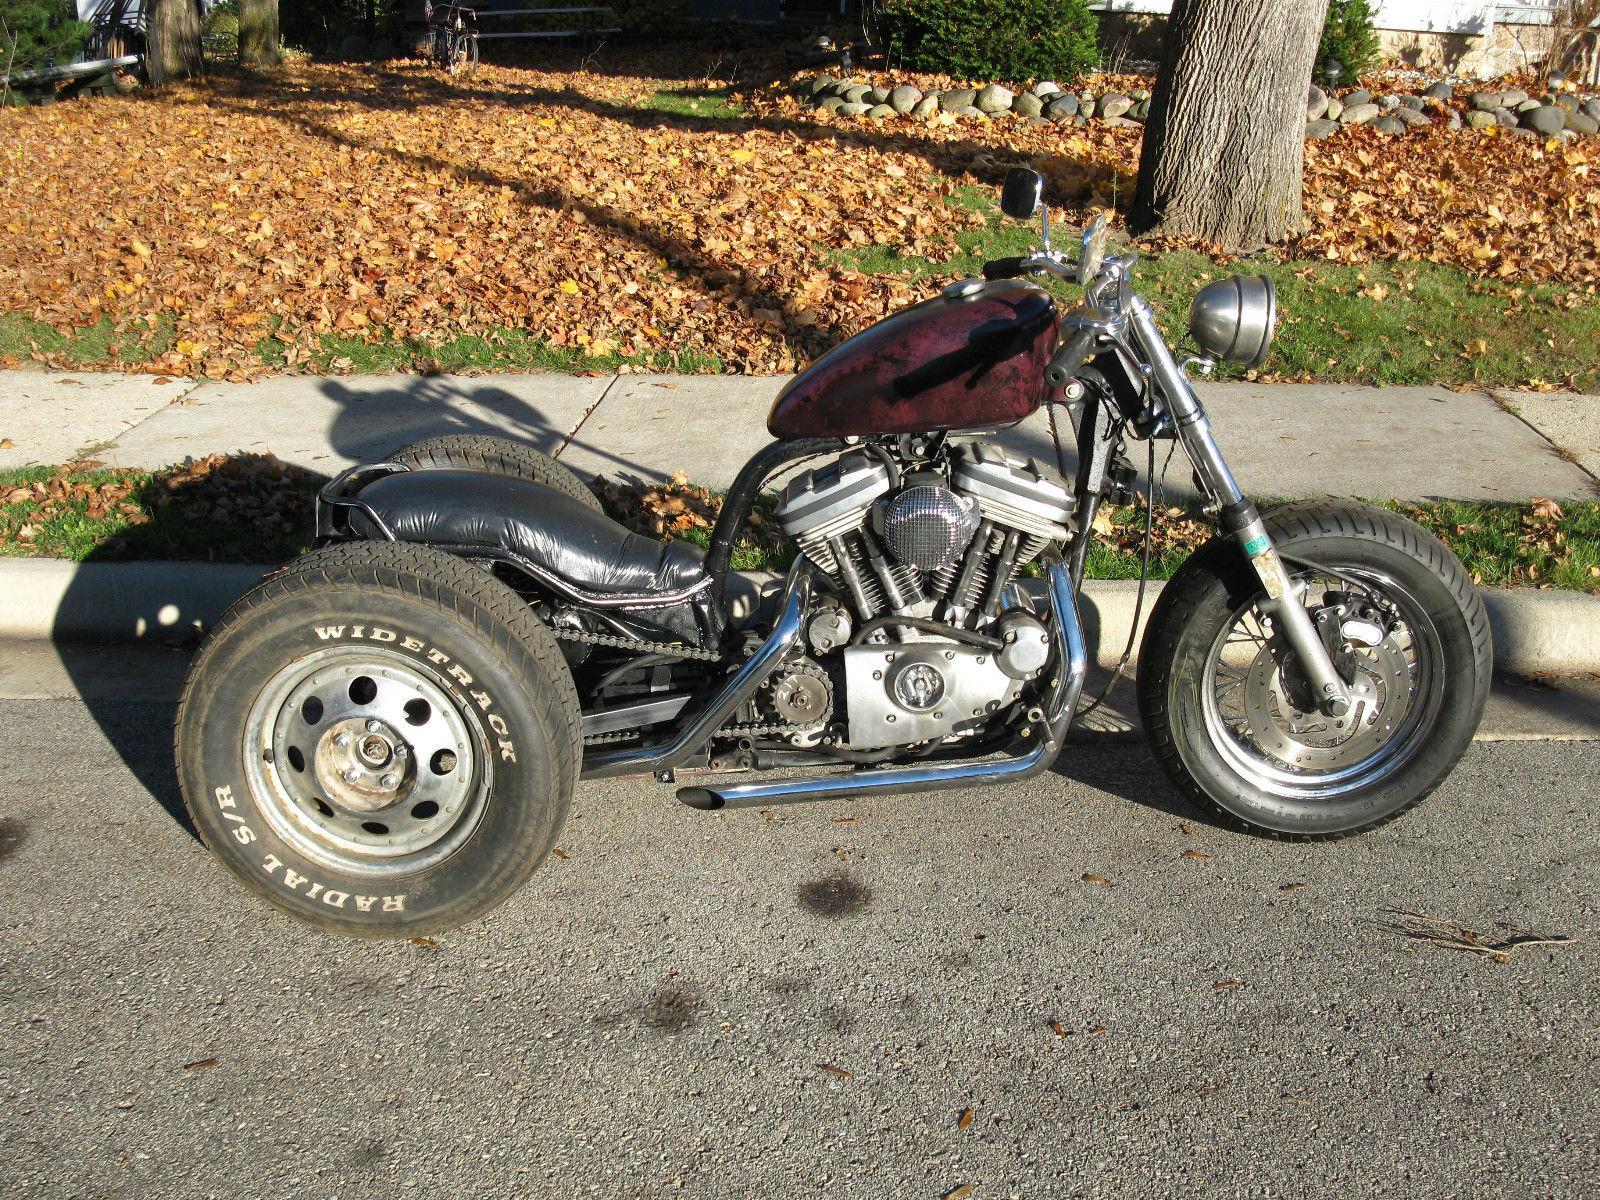 1990 Harley Davidson Sportster Trike Chopper Custom Rat Bike 1200cc 4 Speed